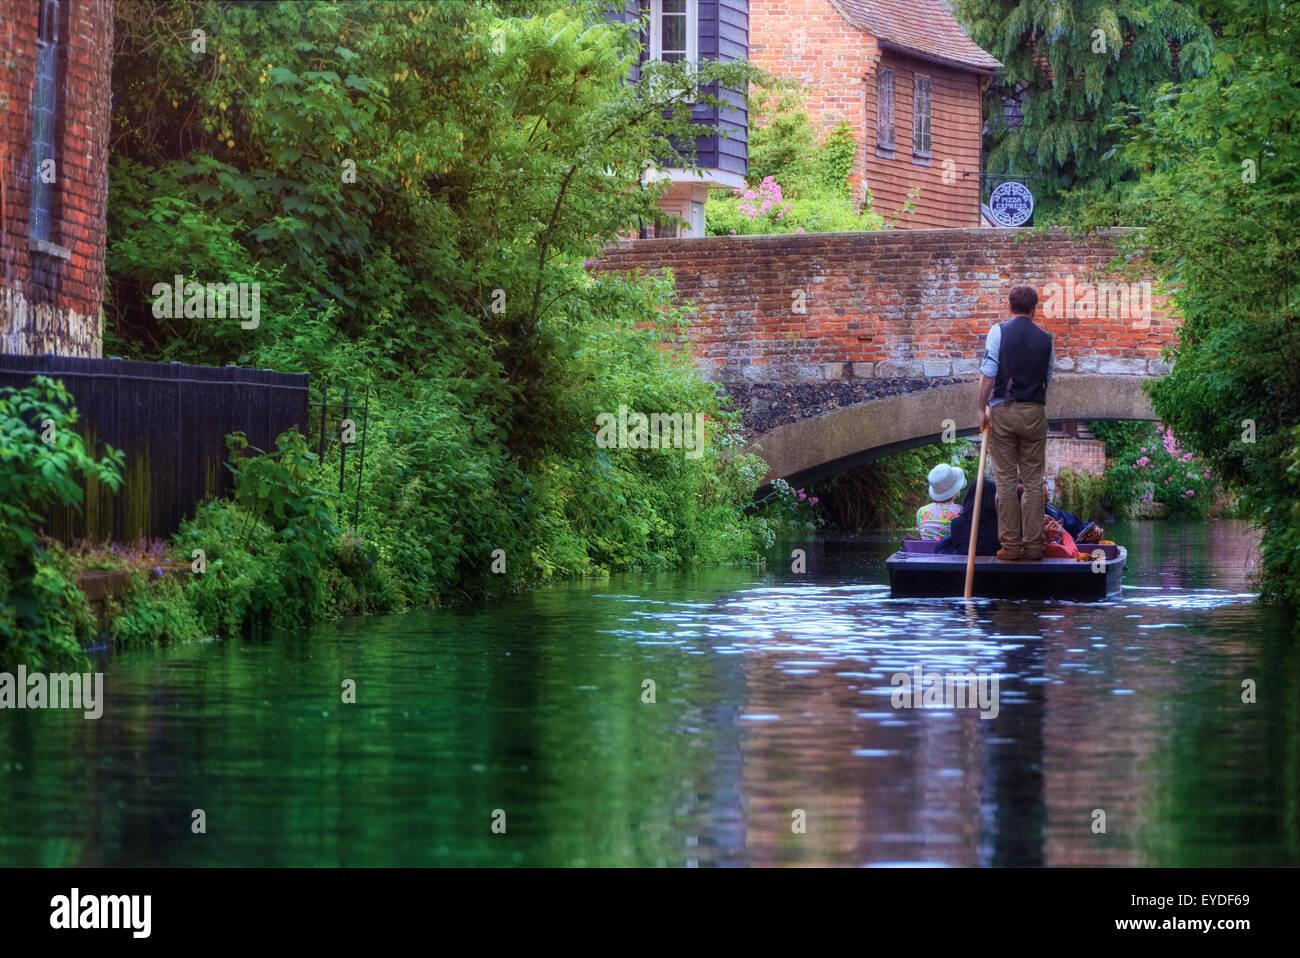 Canterbury, Stour, Kent, England, Regno Unito Immagini Stock